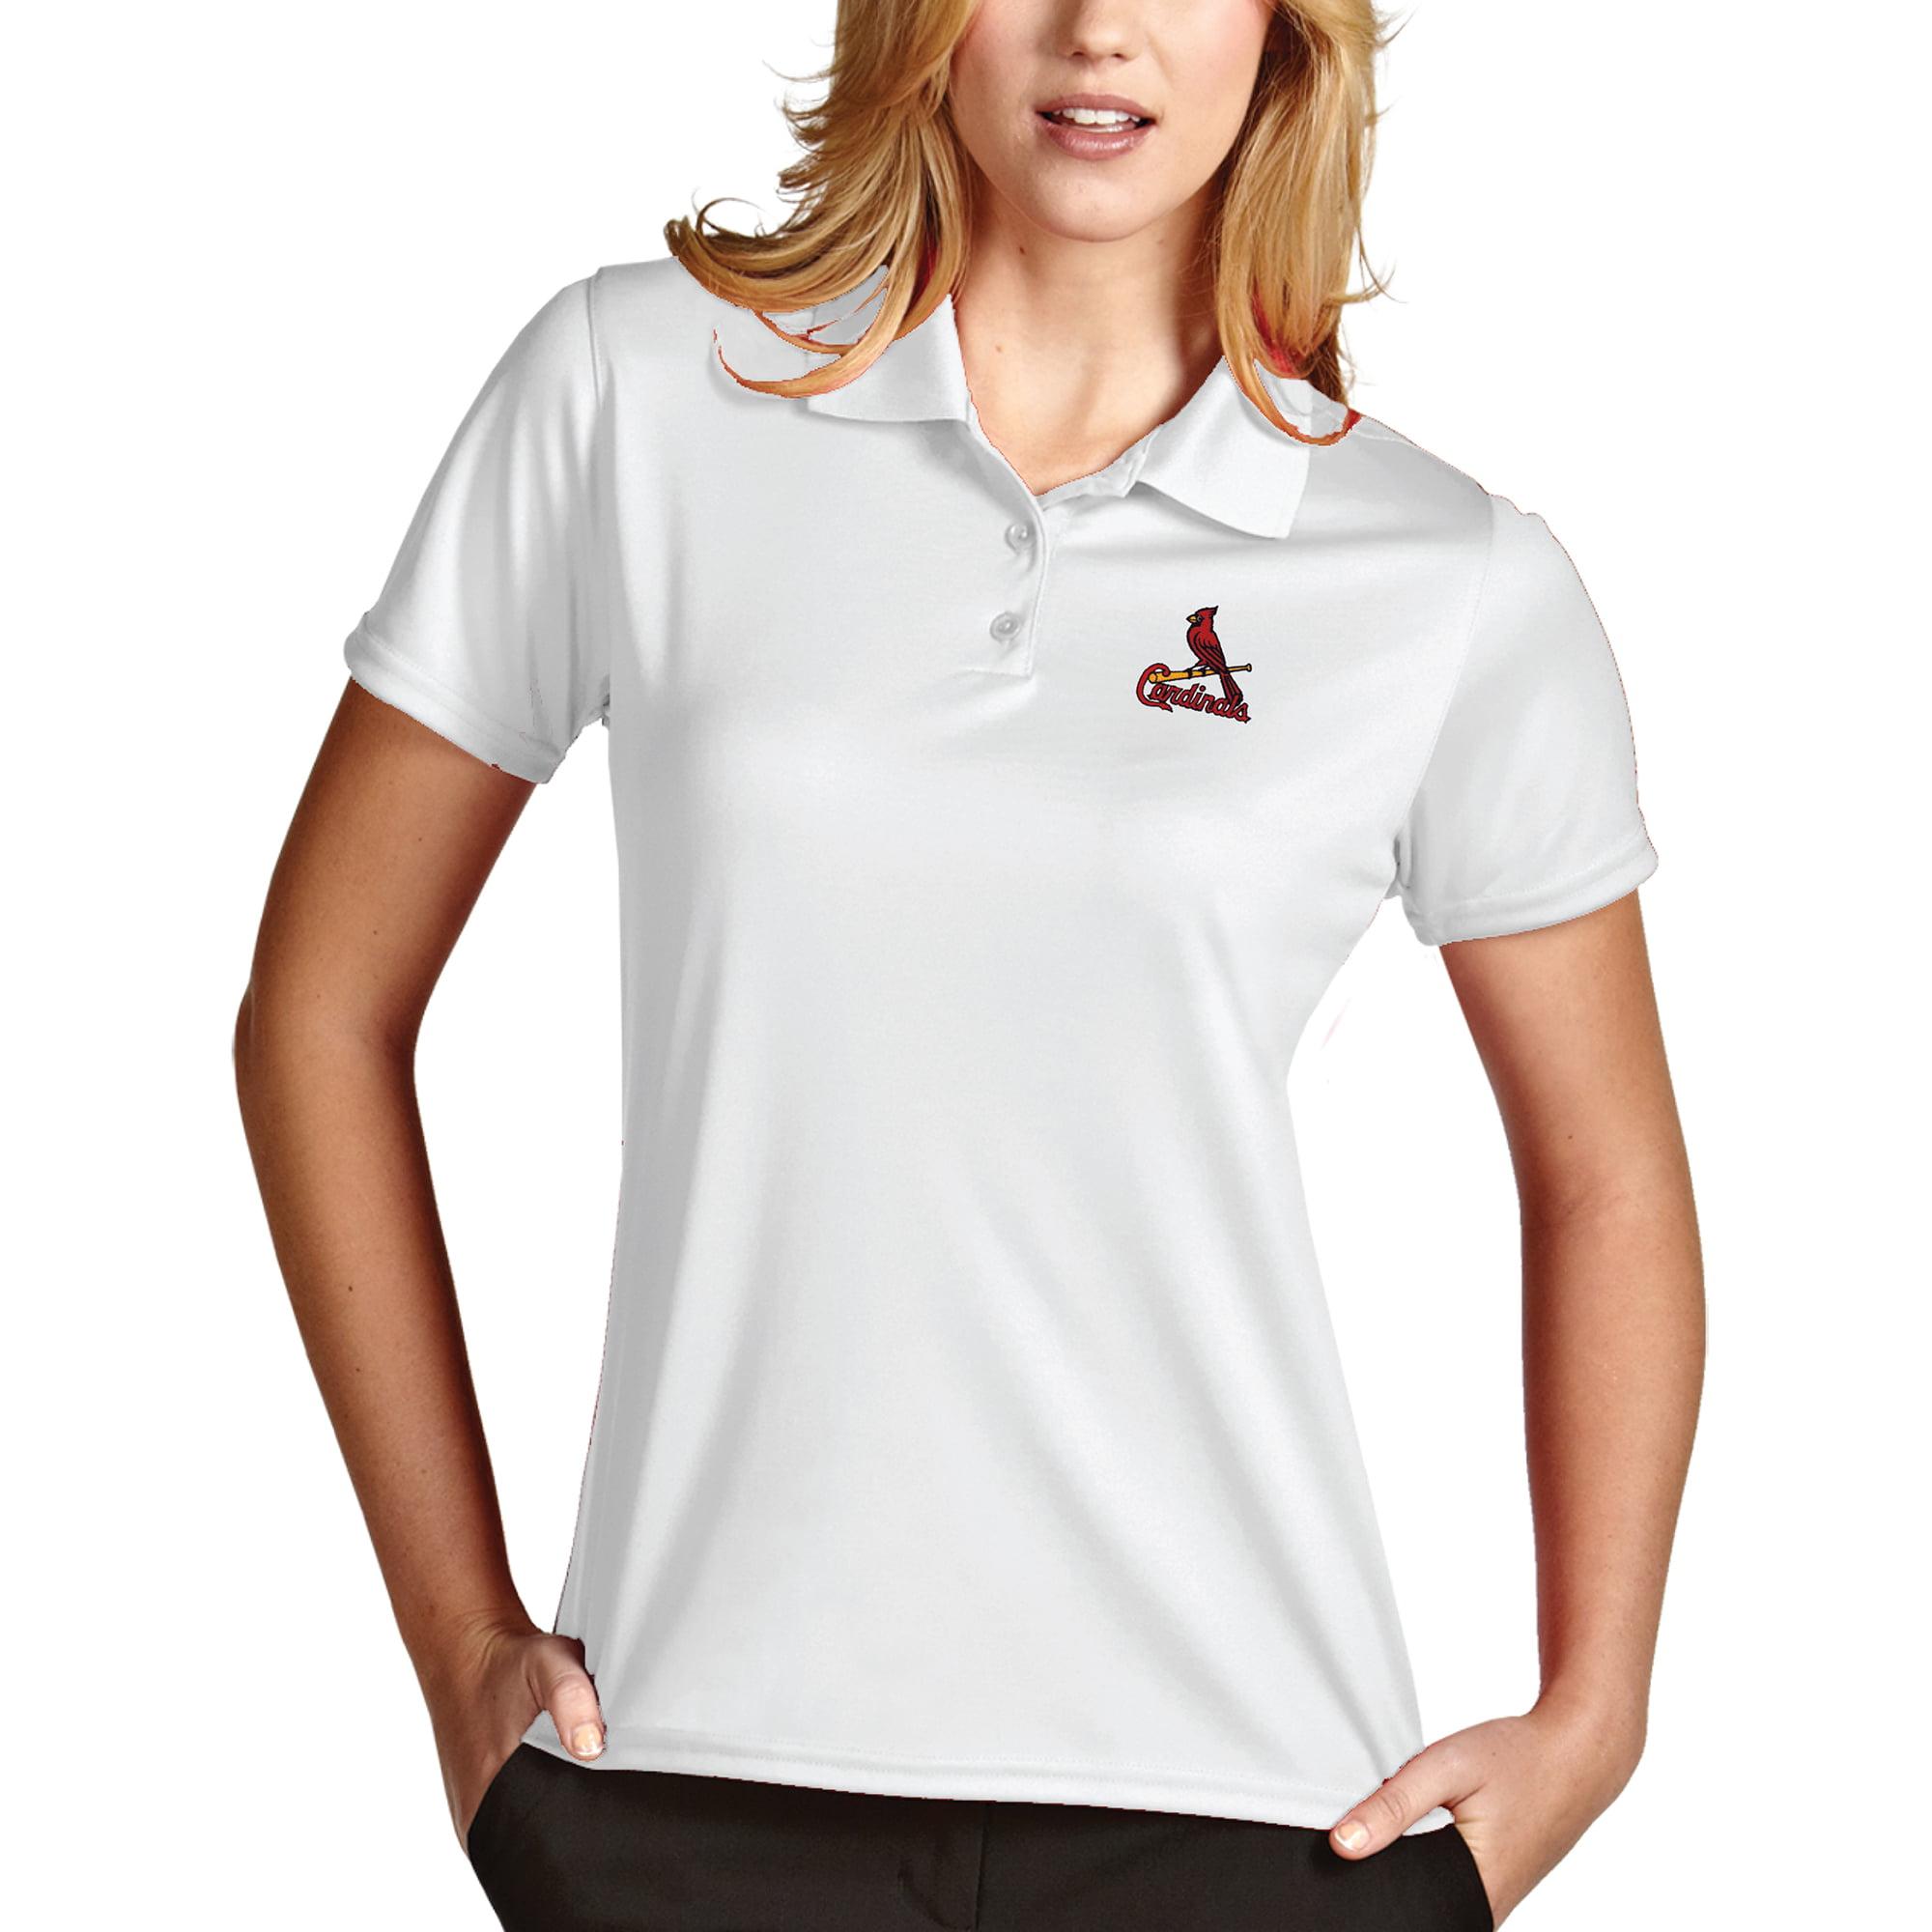 St. Louis Cardinals Antigua Women's Desert Dry Xtra-Lite Exceed Polo - White